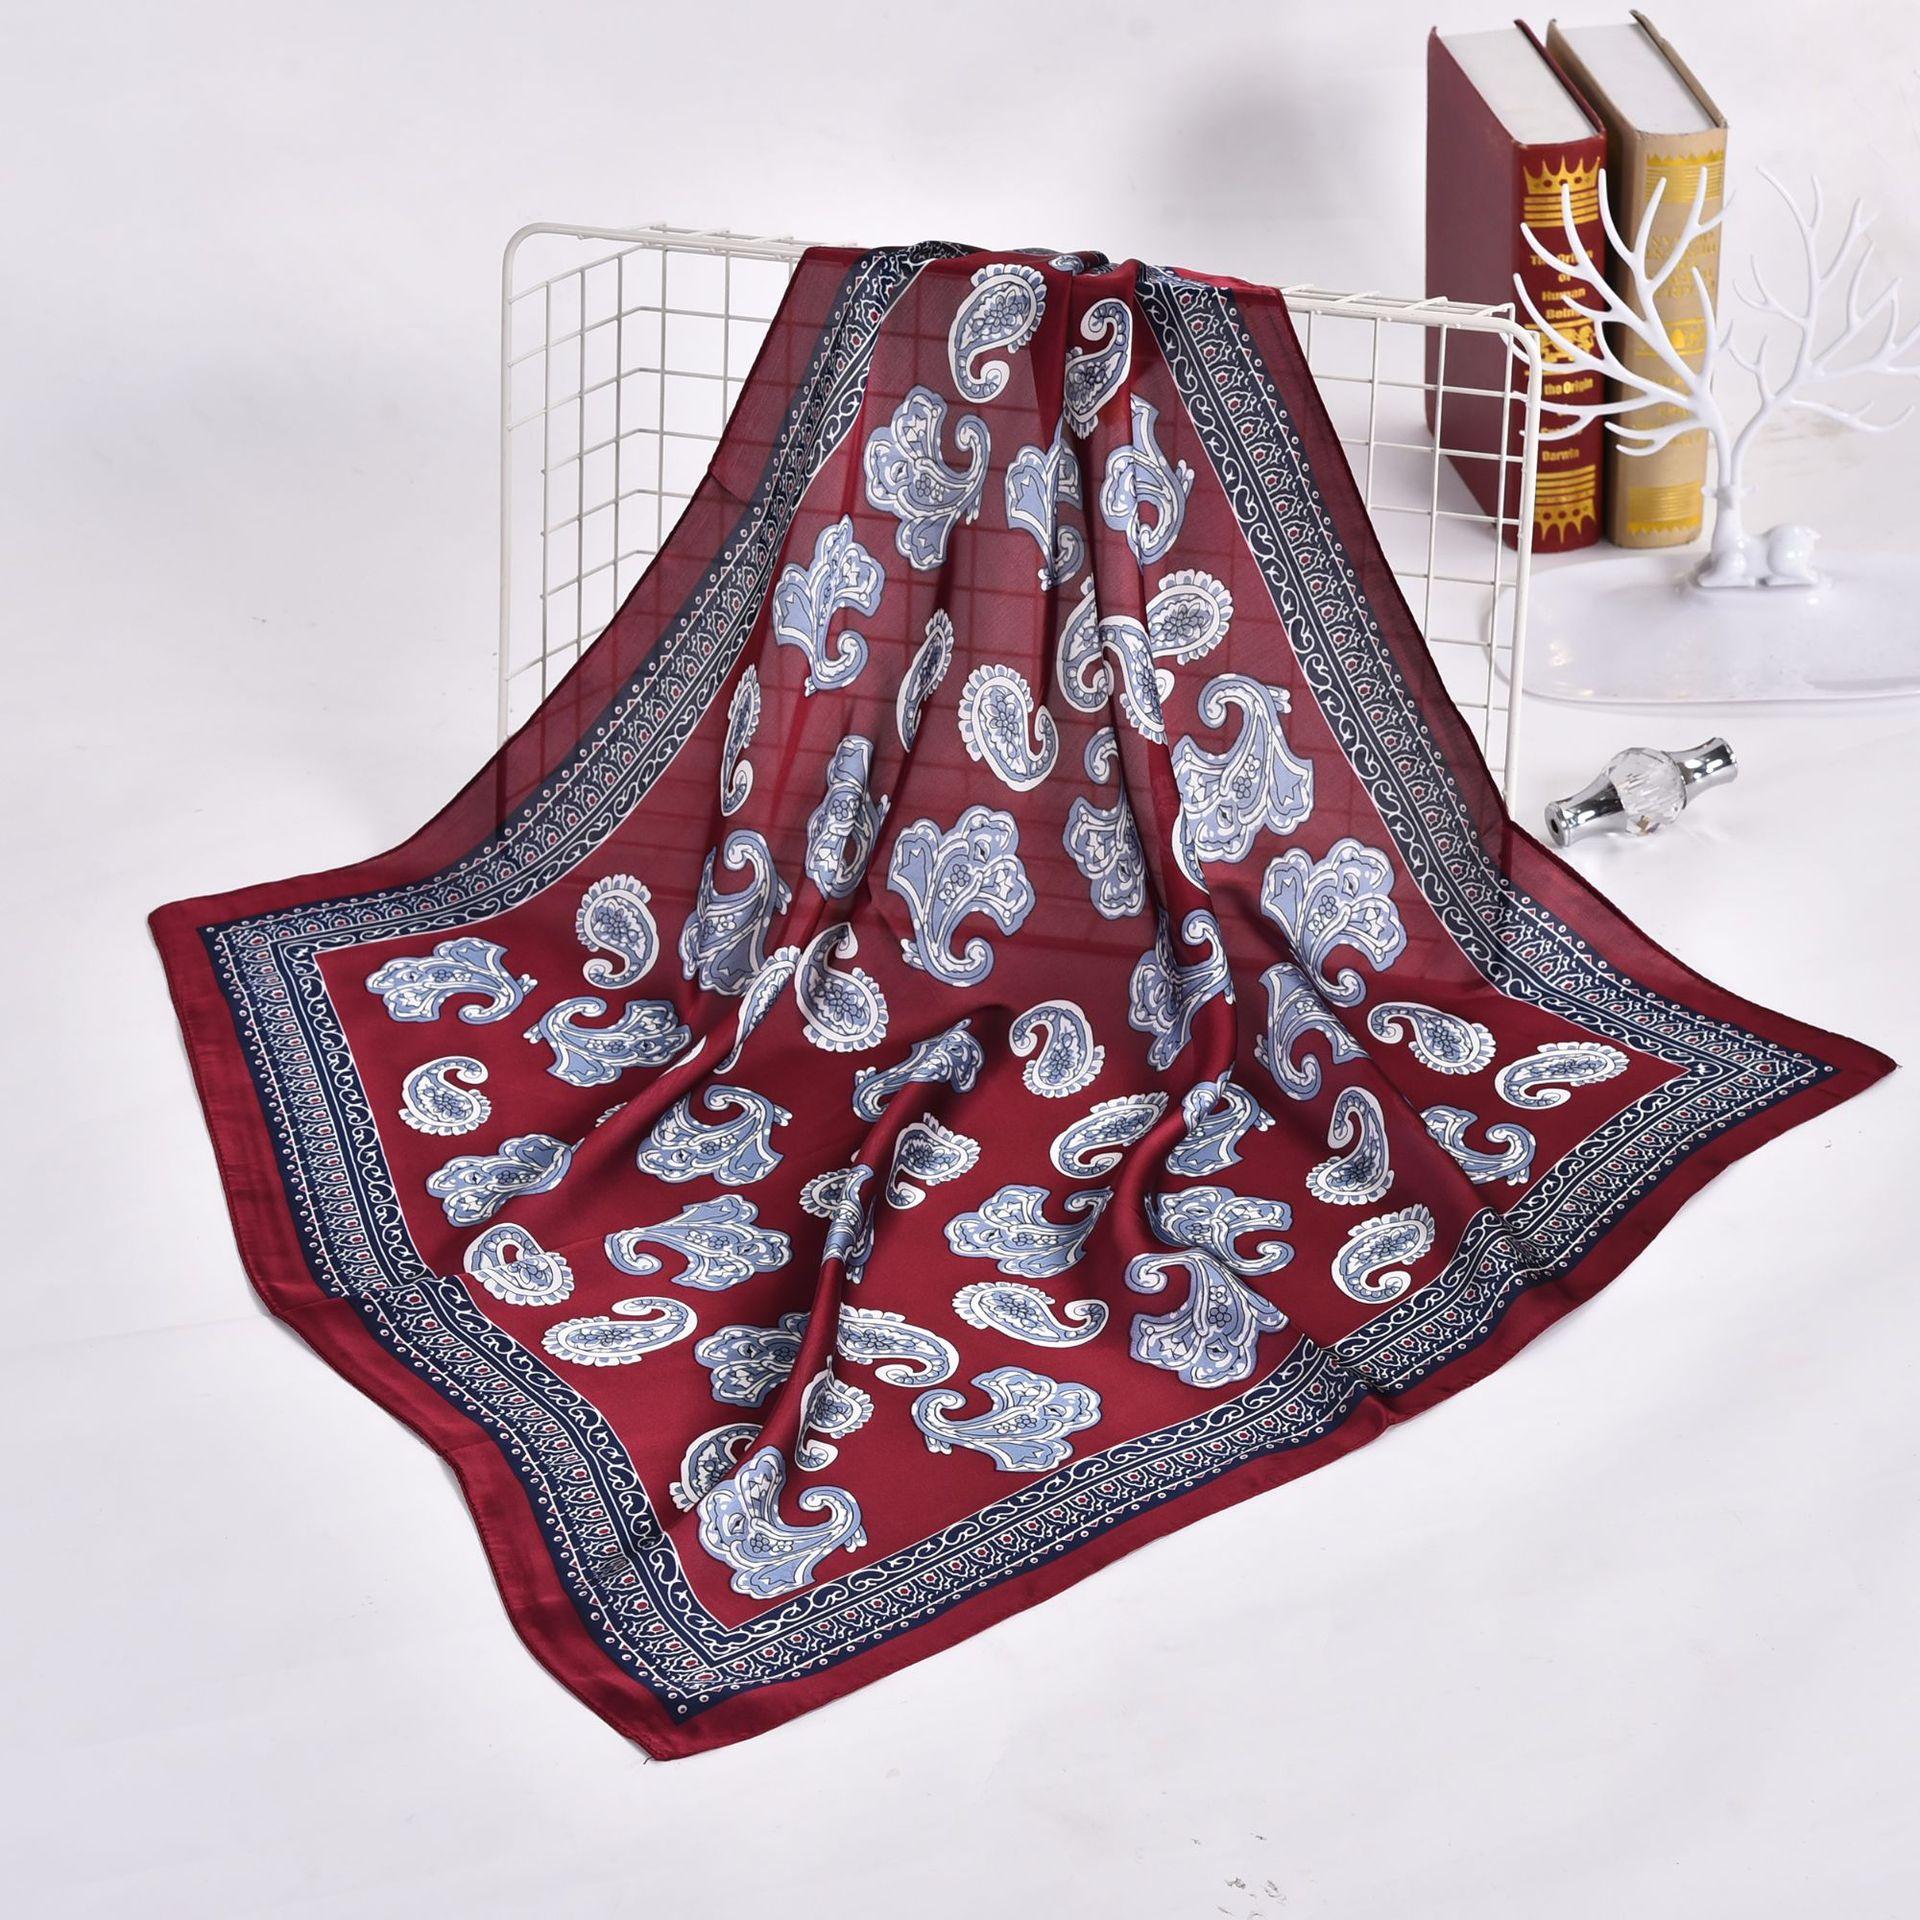 70cm Kerchief Fashion Women Hair Scarf Handkerchief Paisley Print Silk Satin Bag Scarfs Square Headband Small Neck Scarves 2019